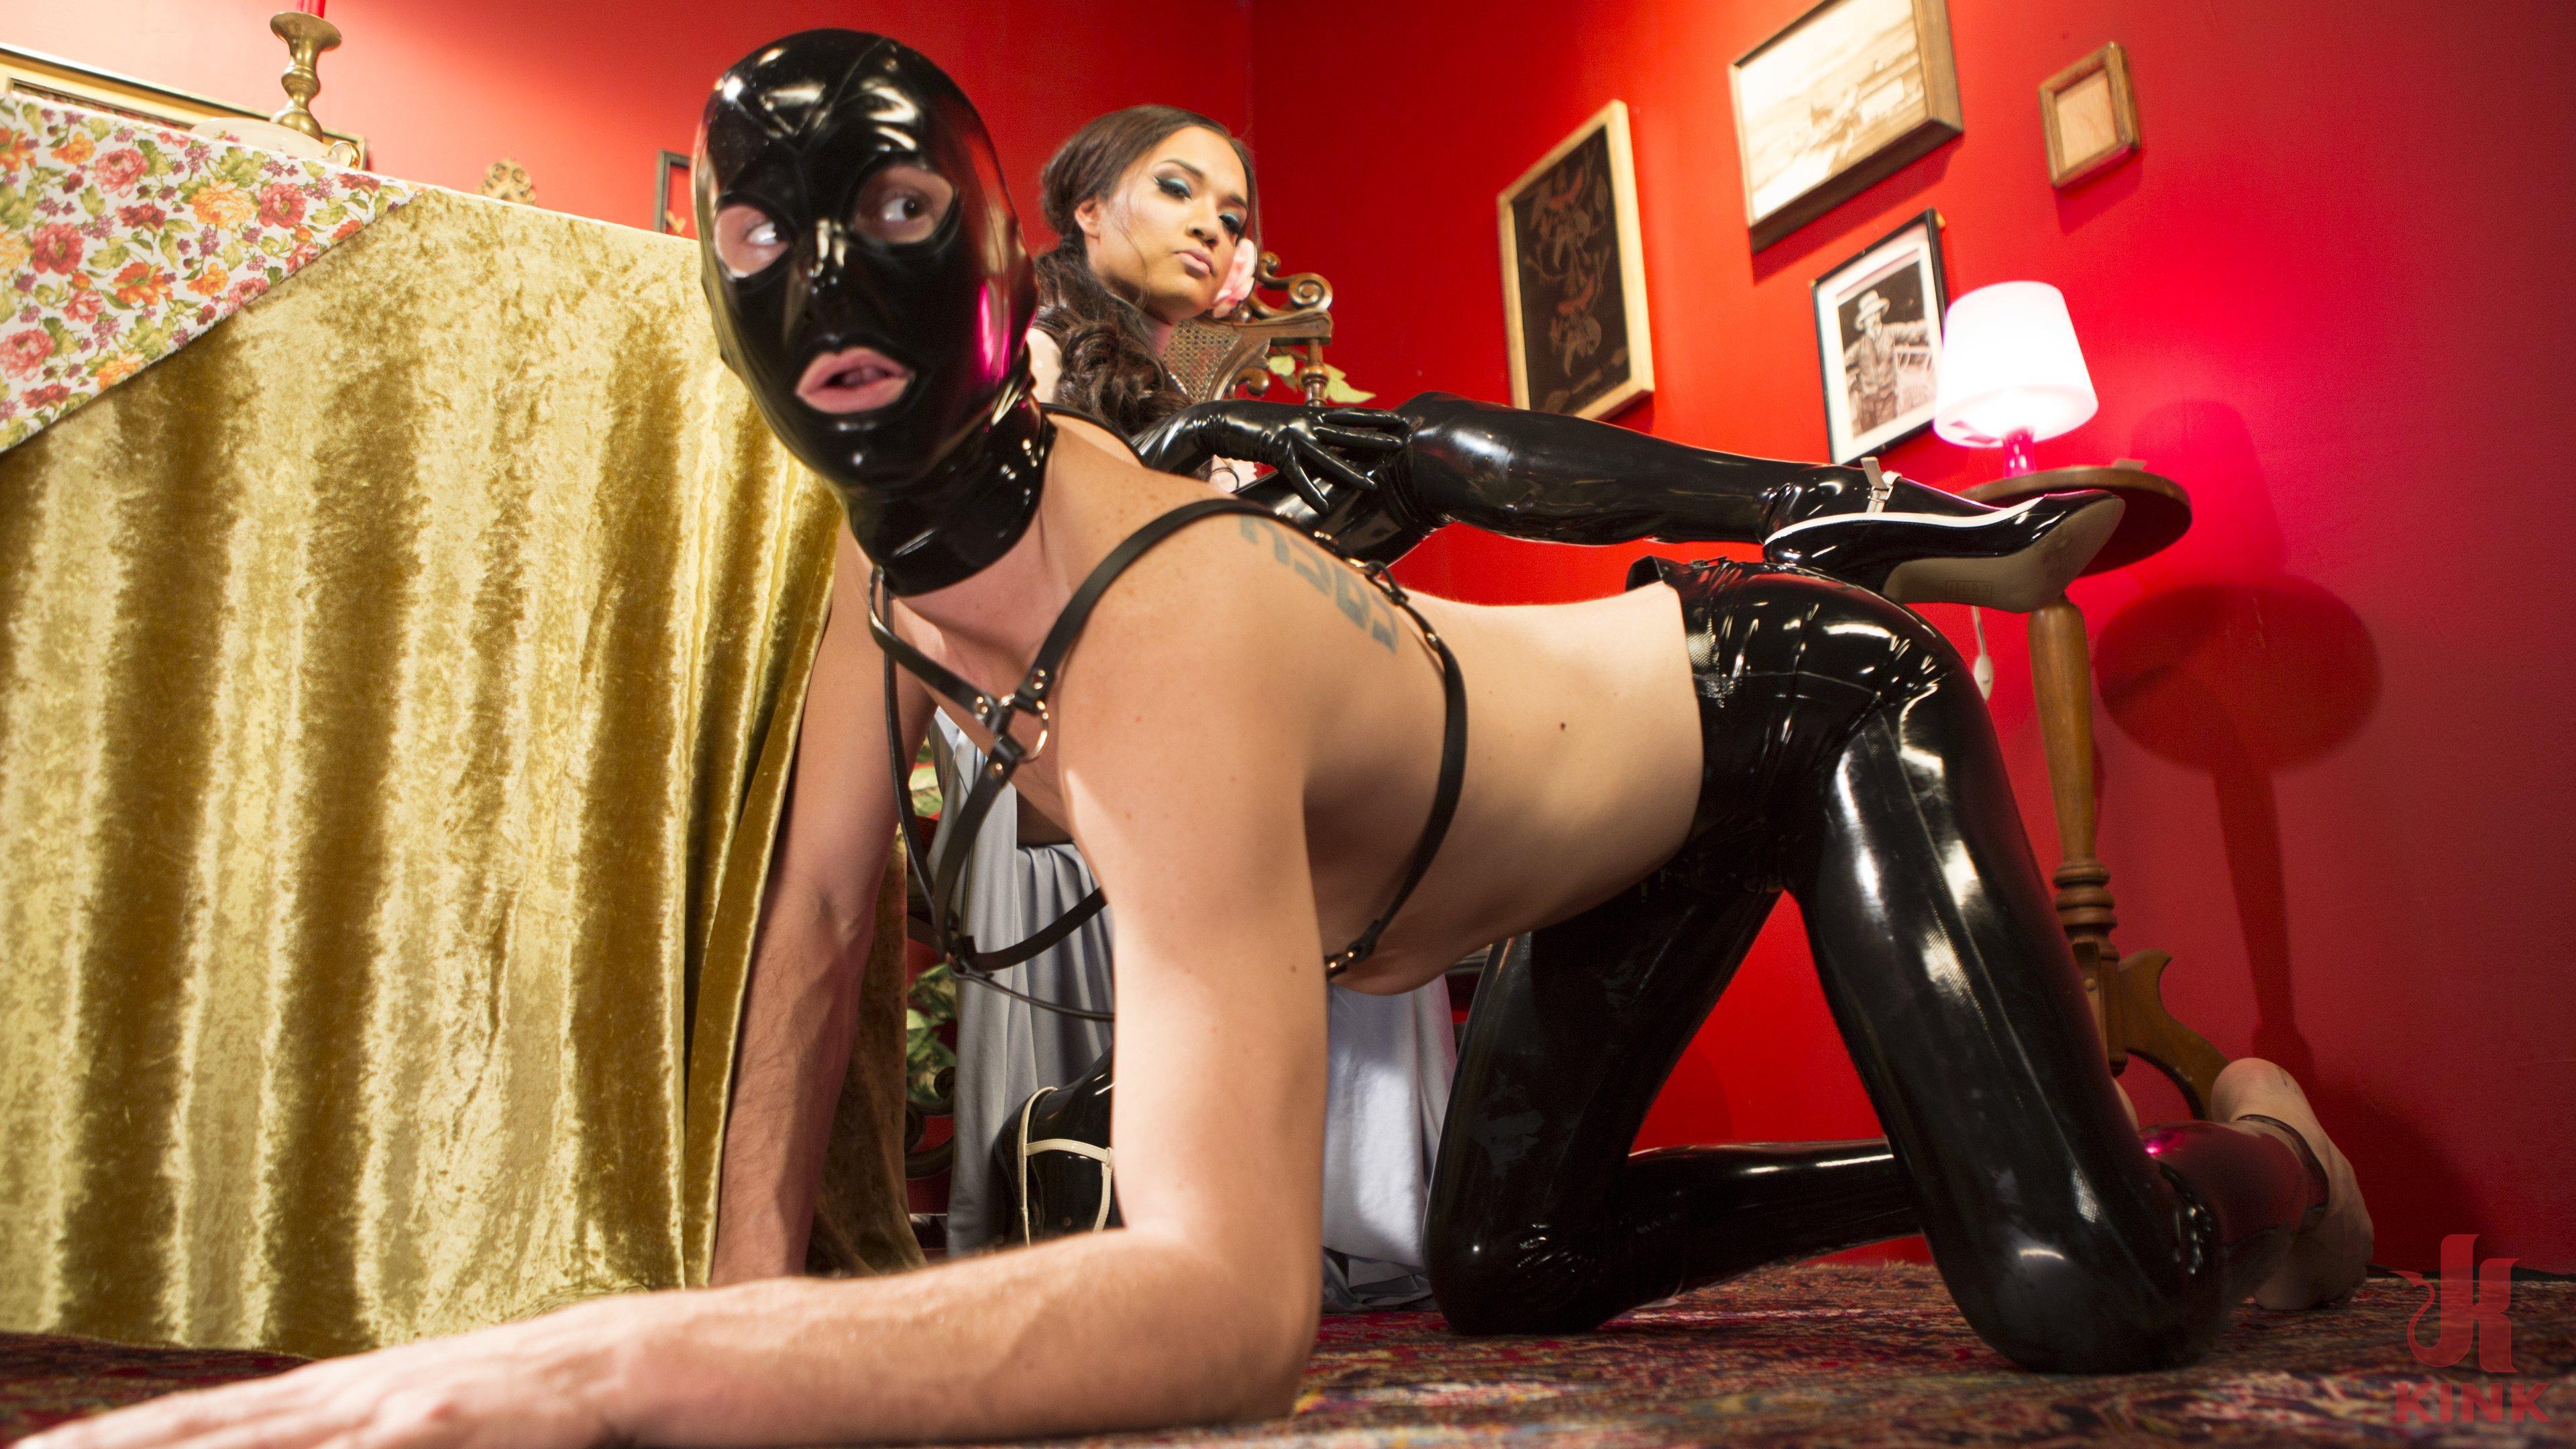 Tea Party Kinky con Jessica Fox (Kink)